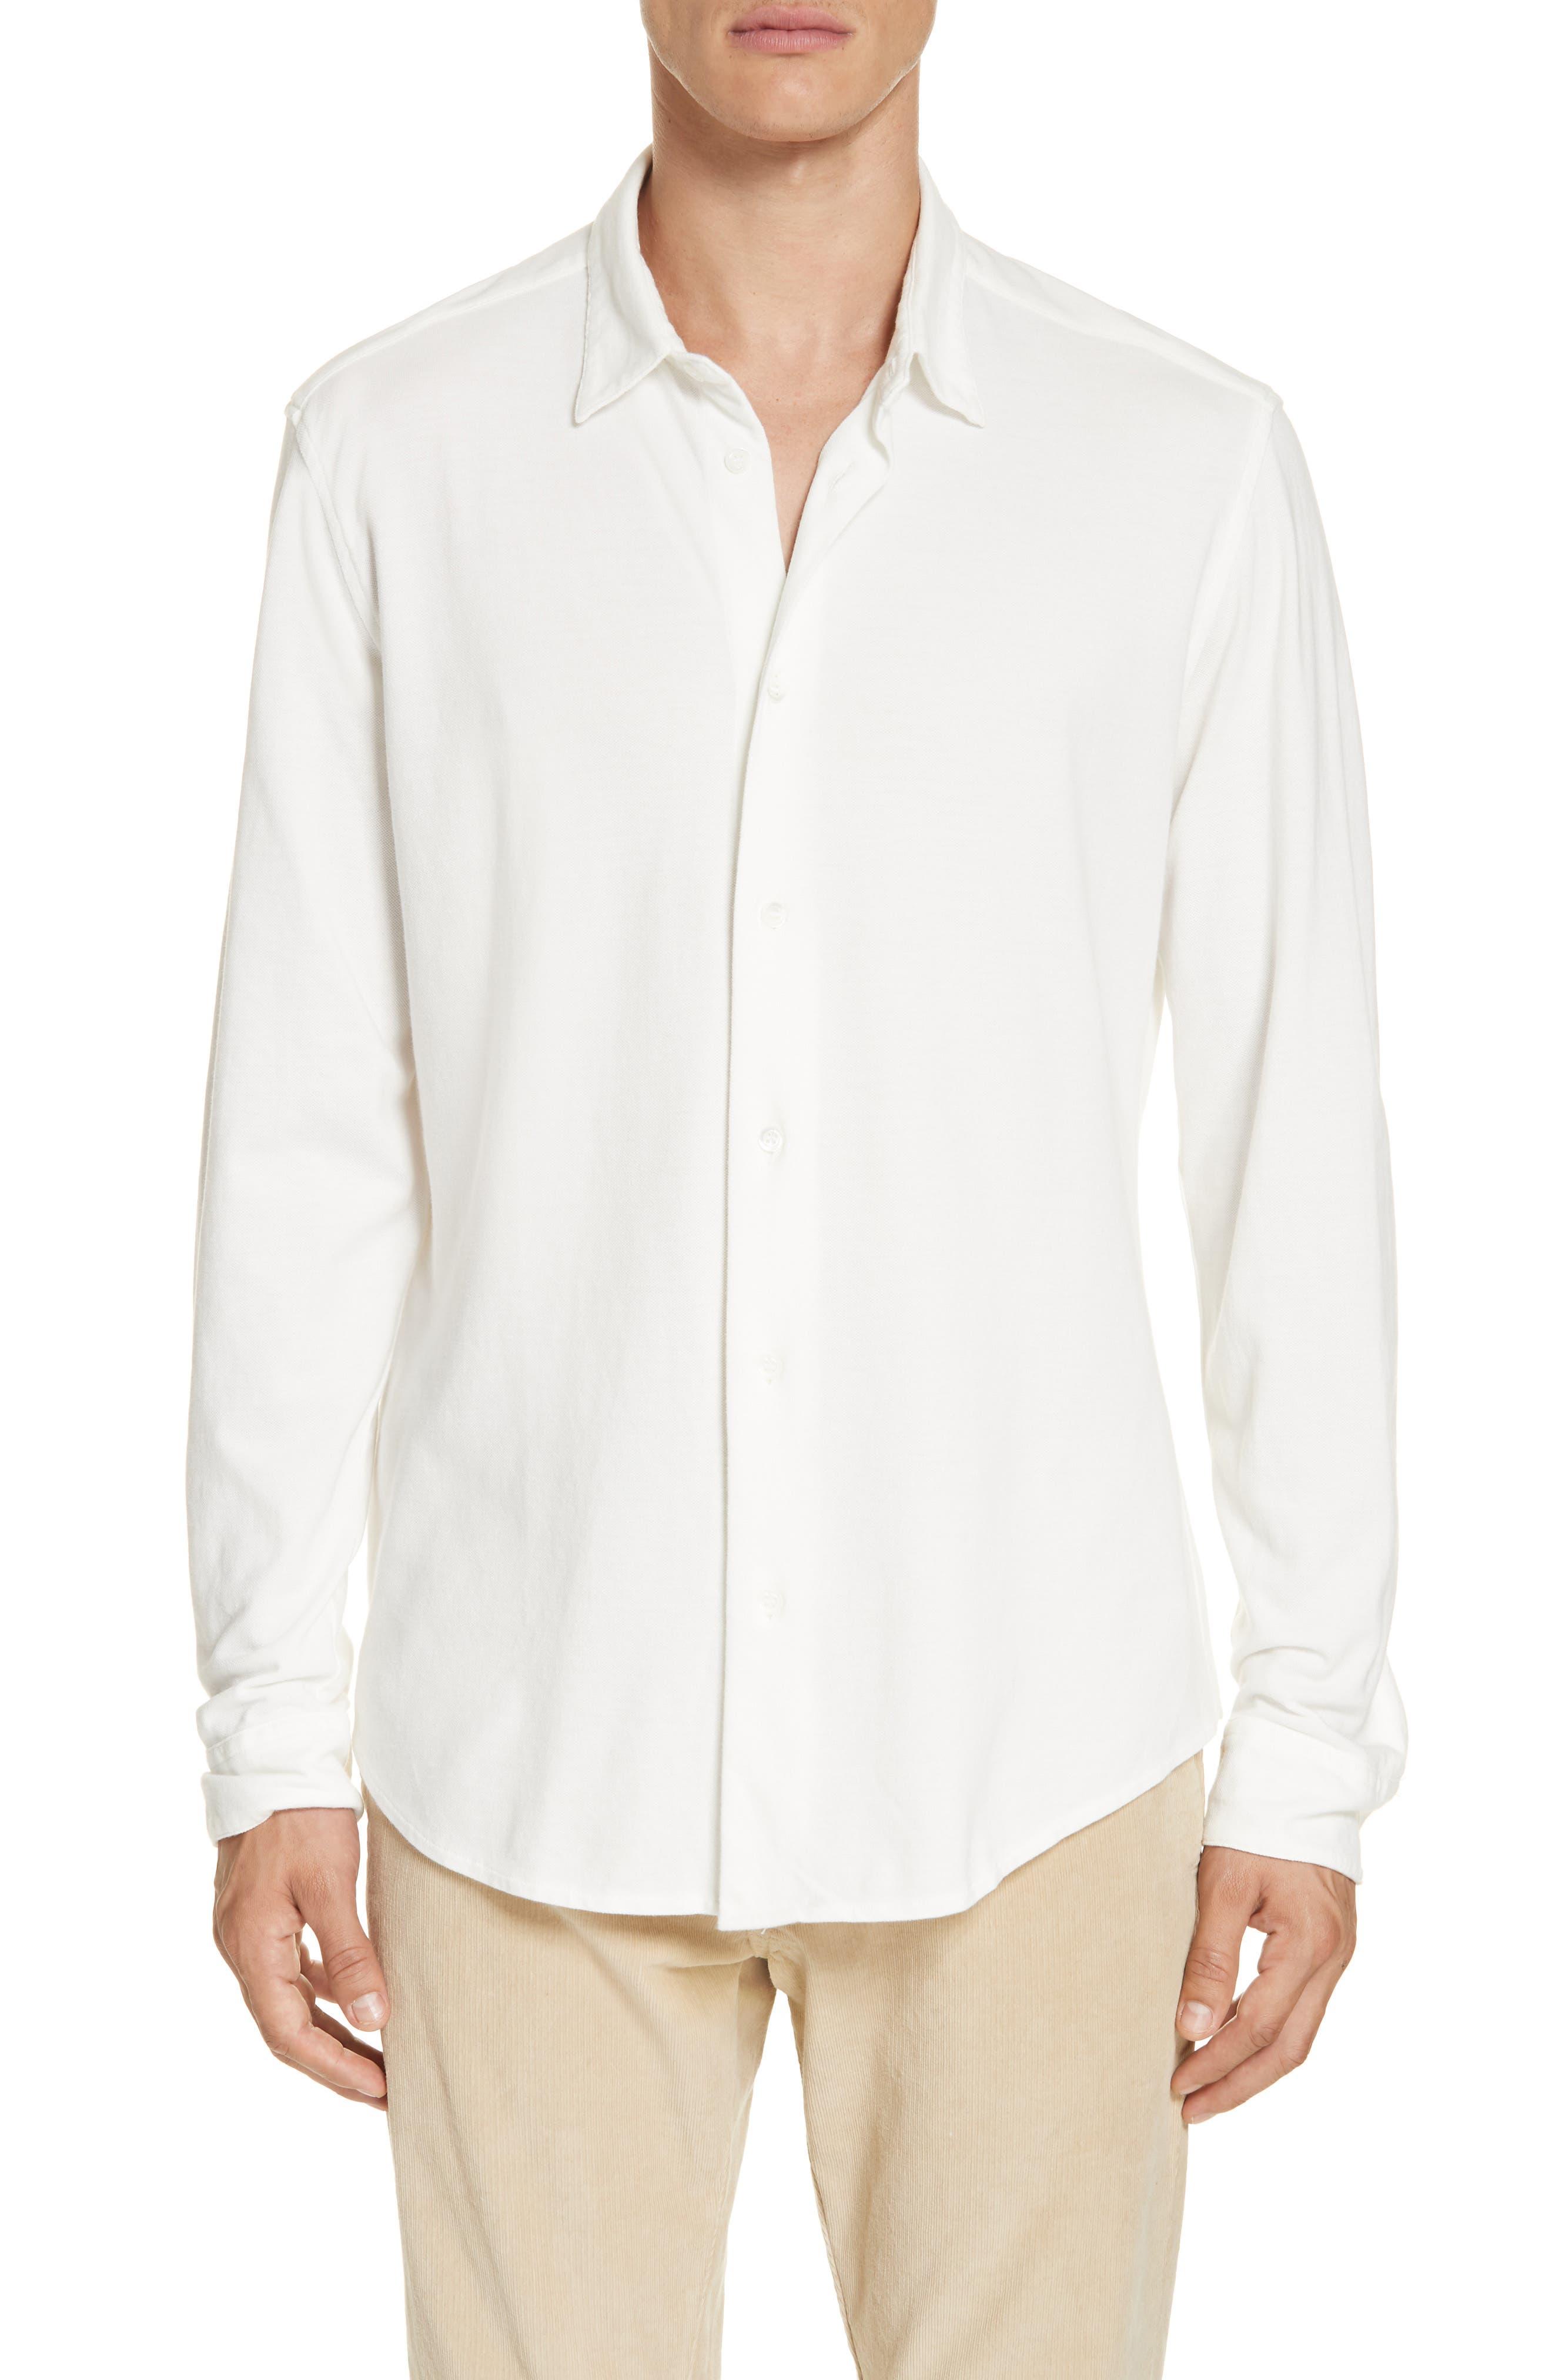 Coppi Tamiso Sport Shirt,                         Main,                         color, WHITE